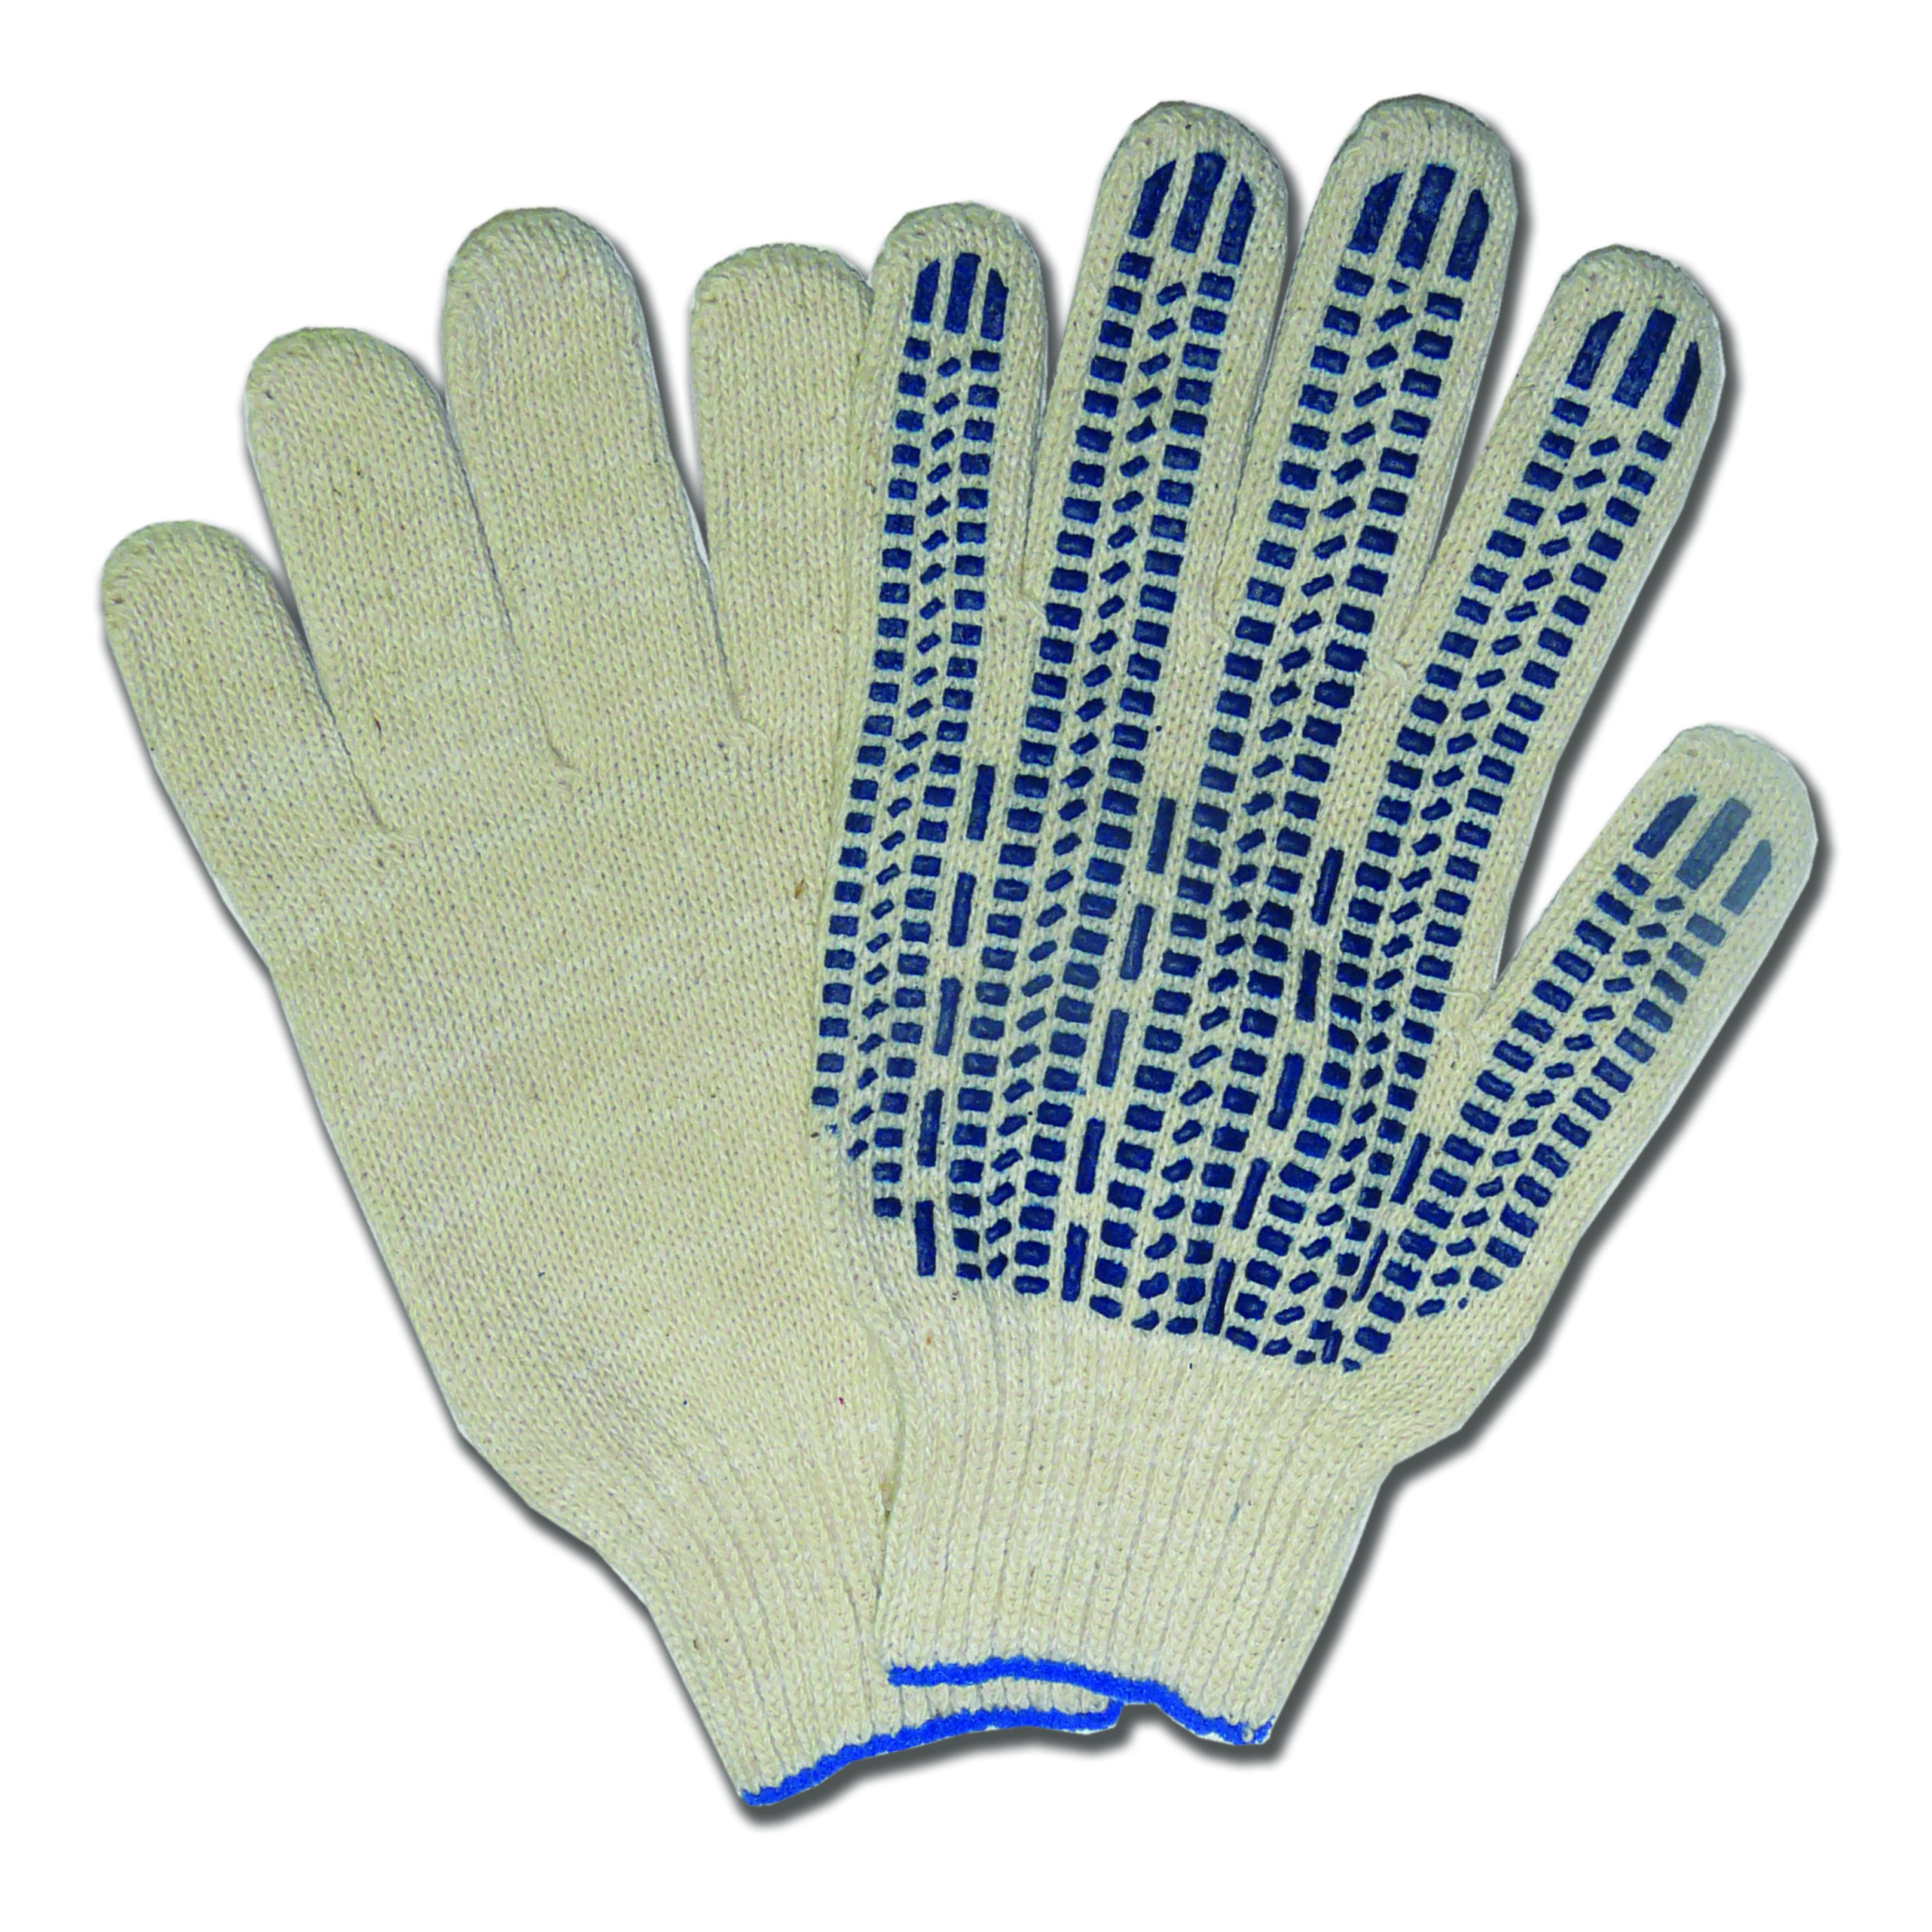 схема перчаток на один палец